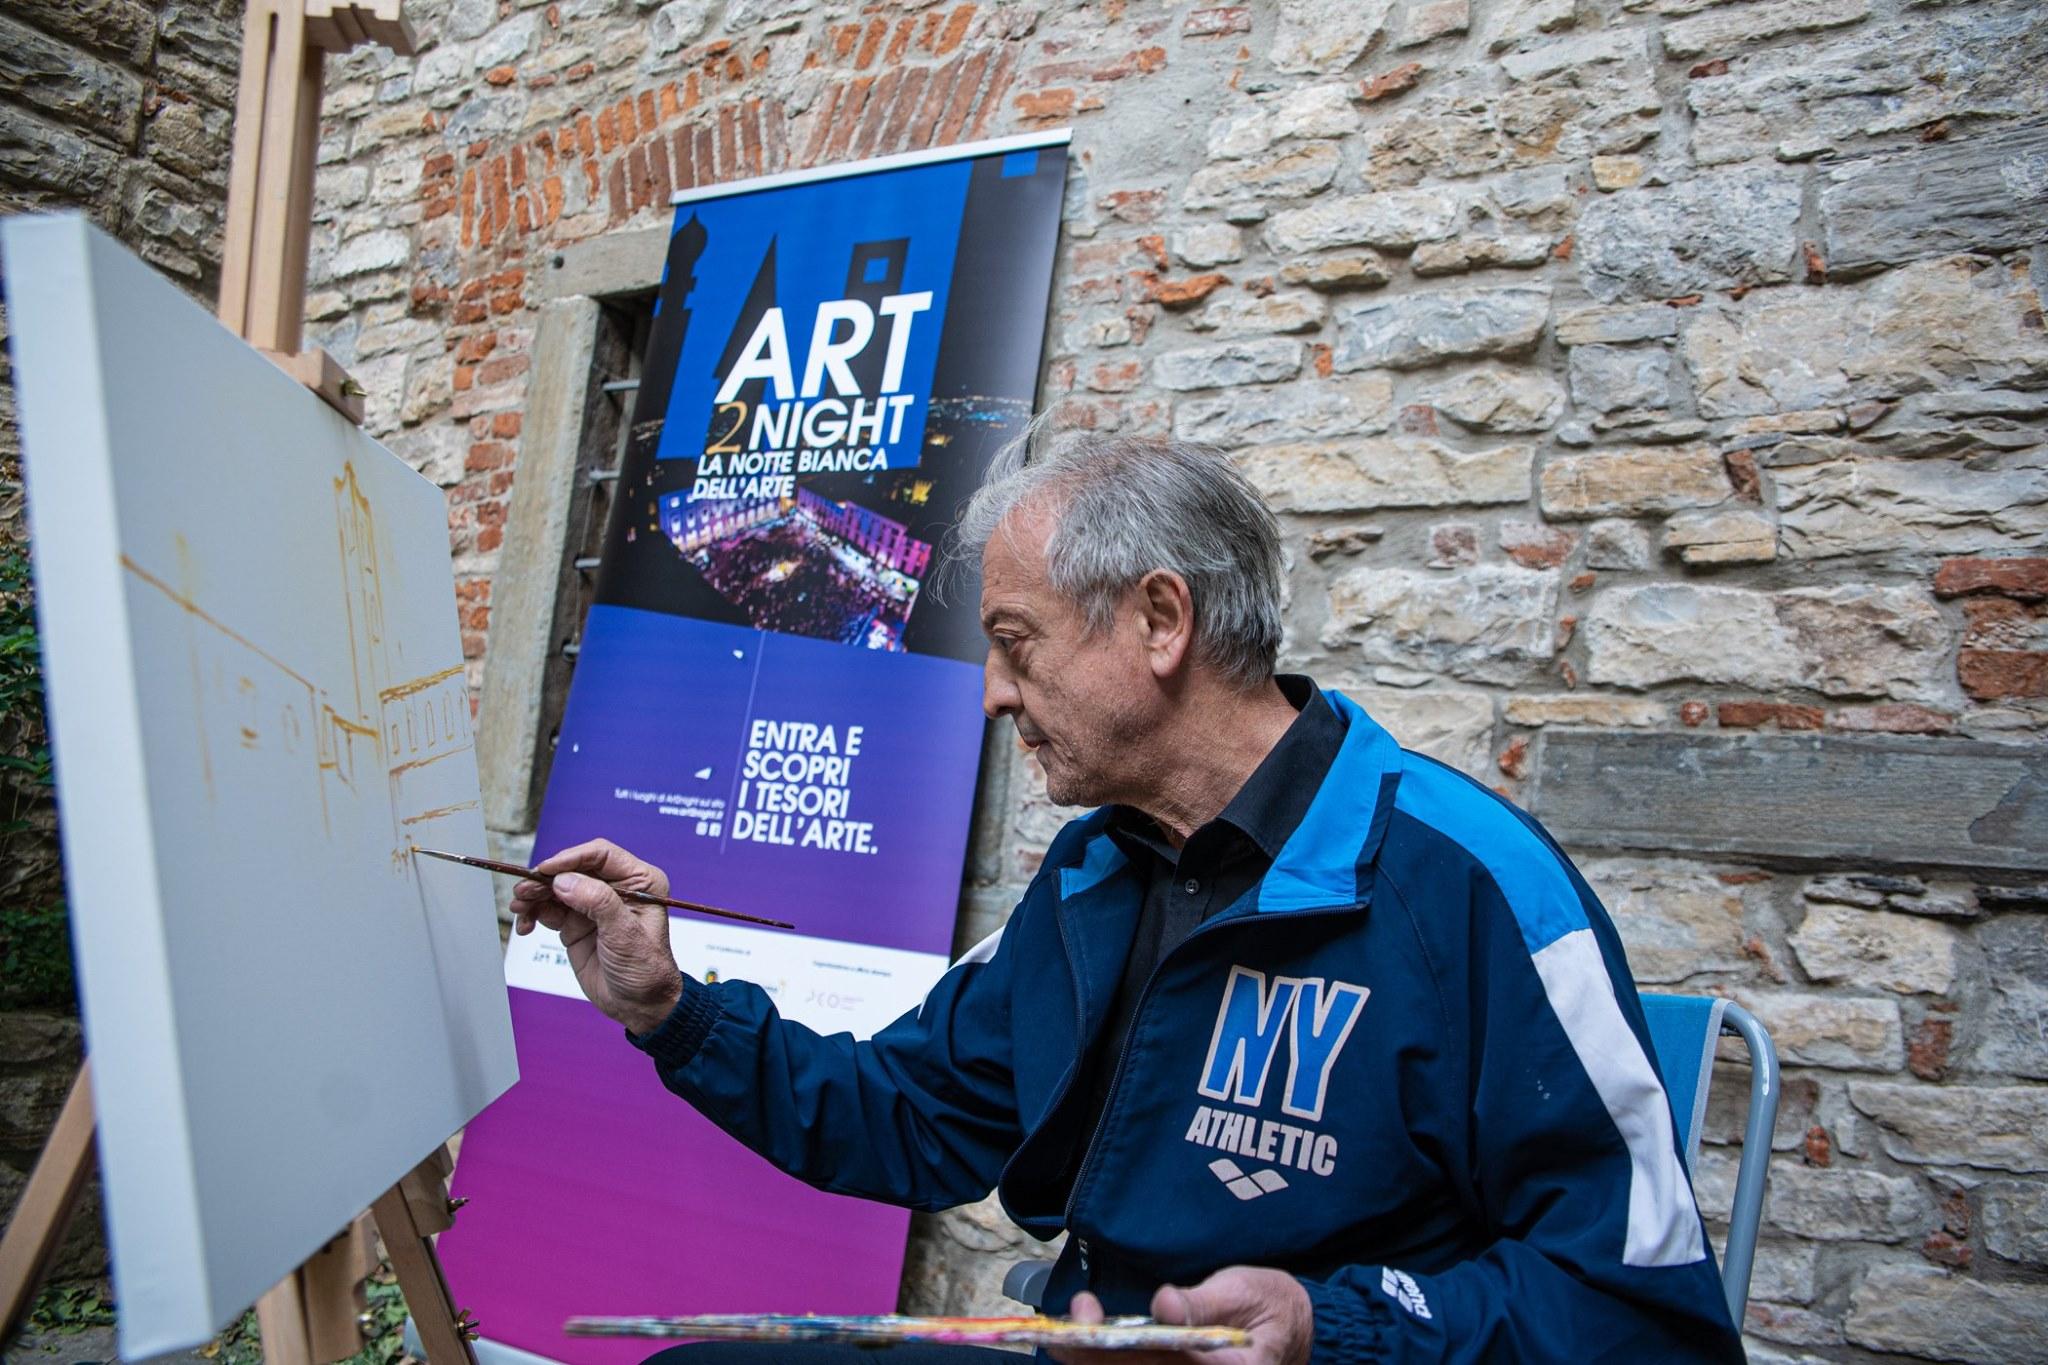 Art2night Corvino Leonardo